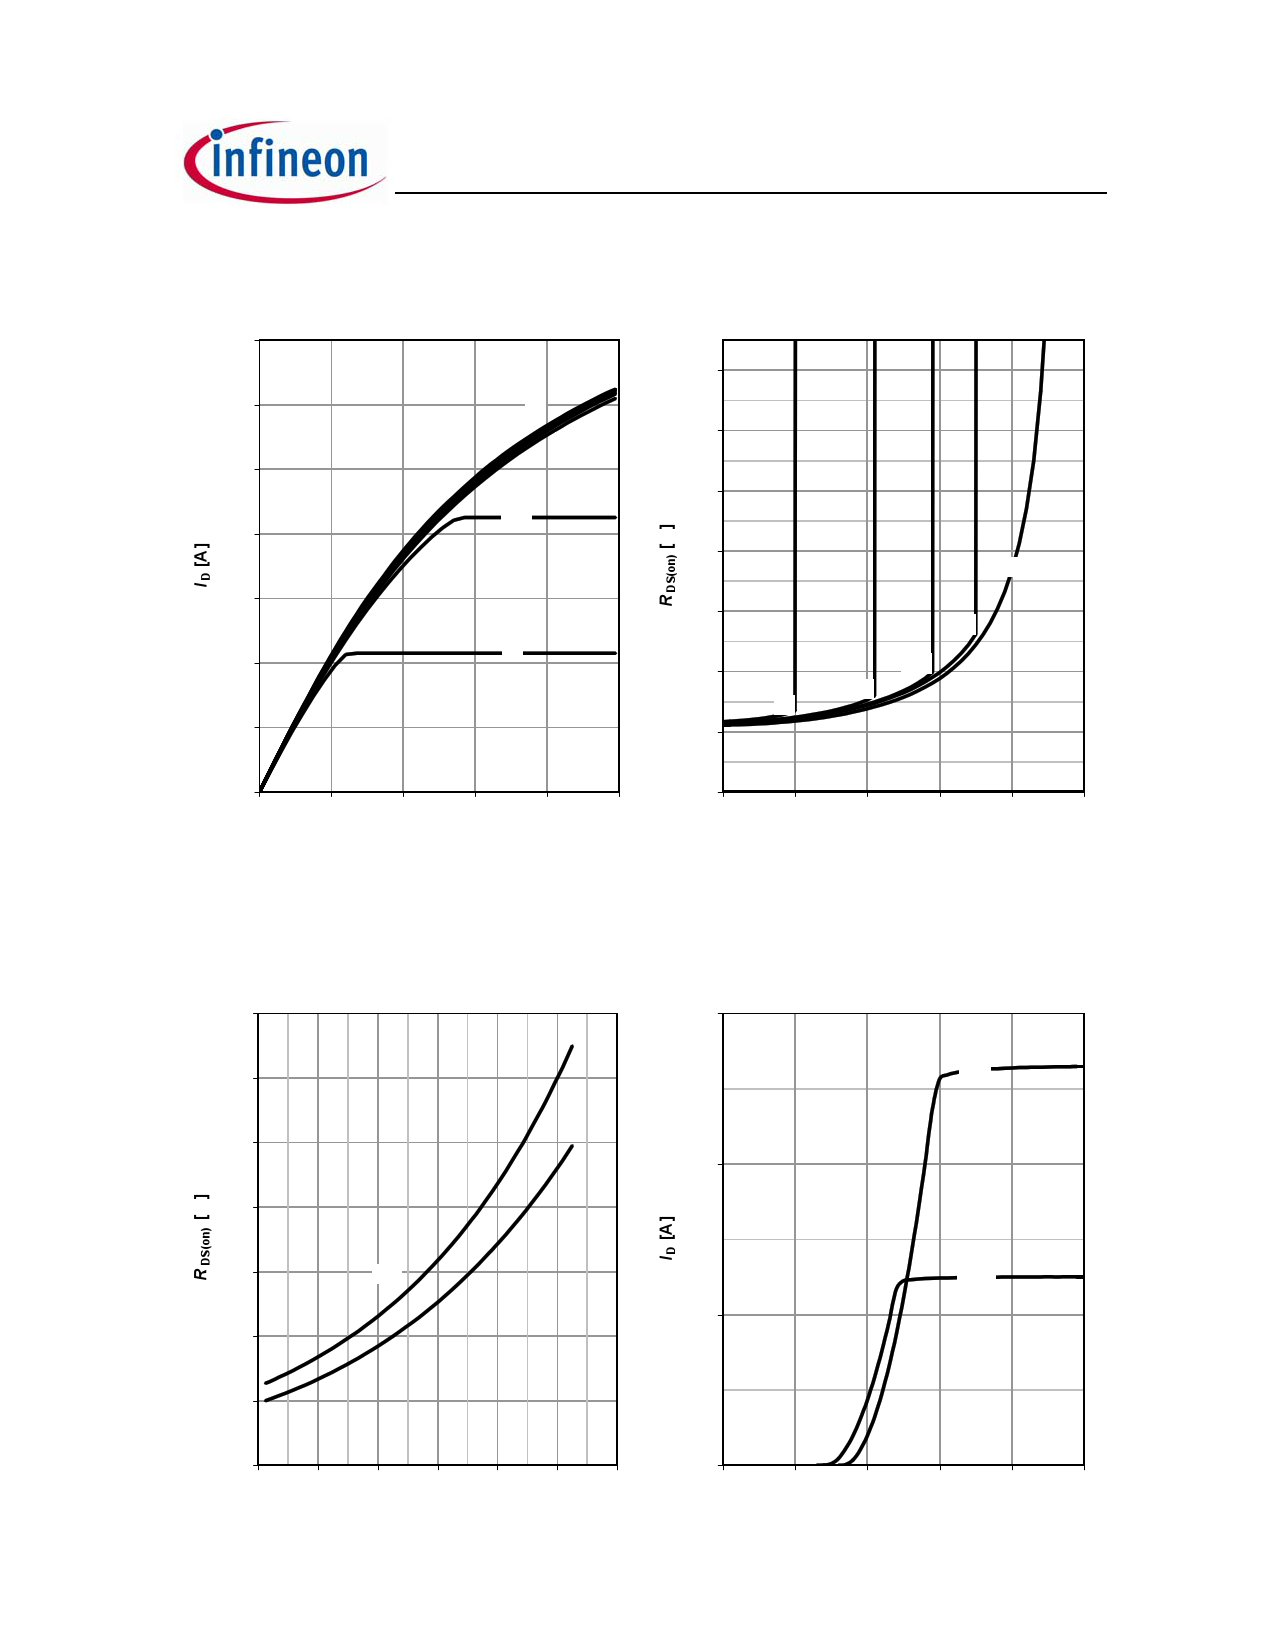 IPI90R1K2C3 pdf, arduino